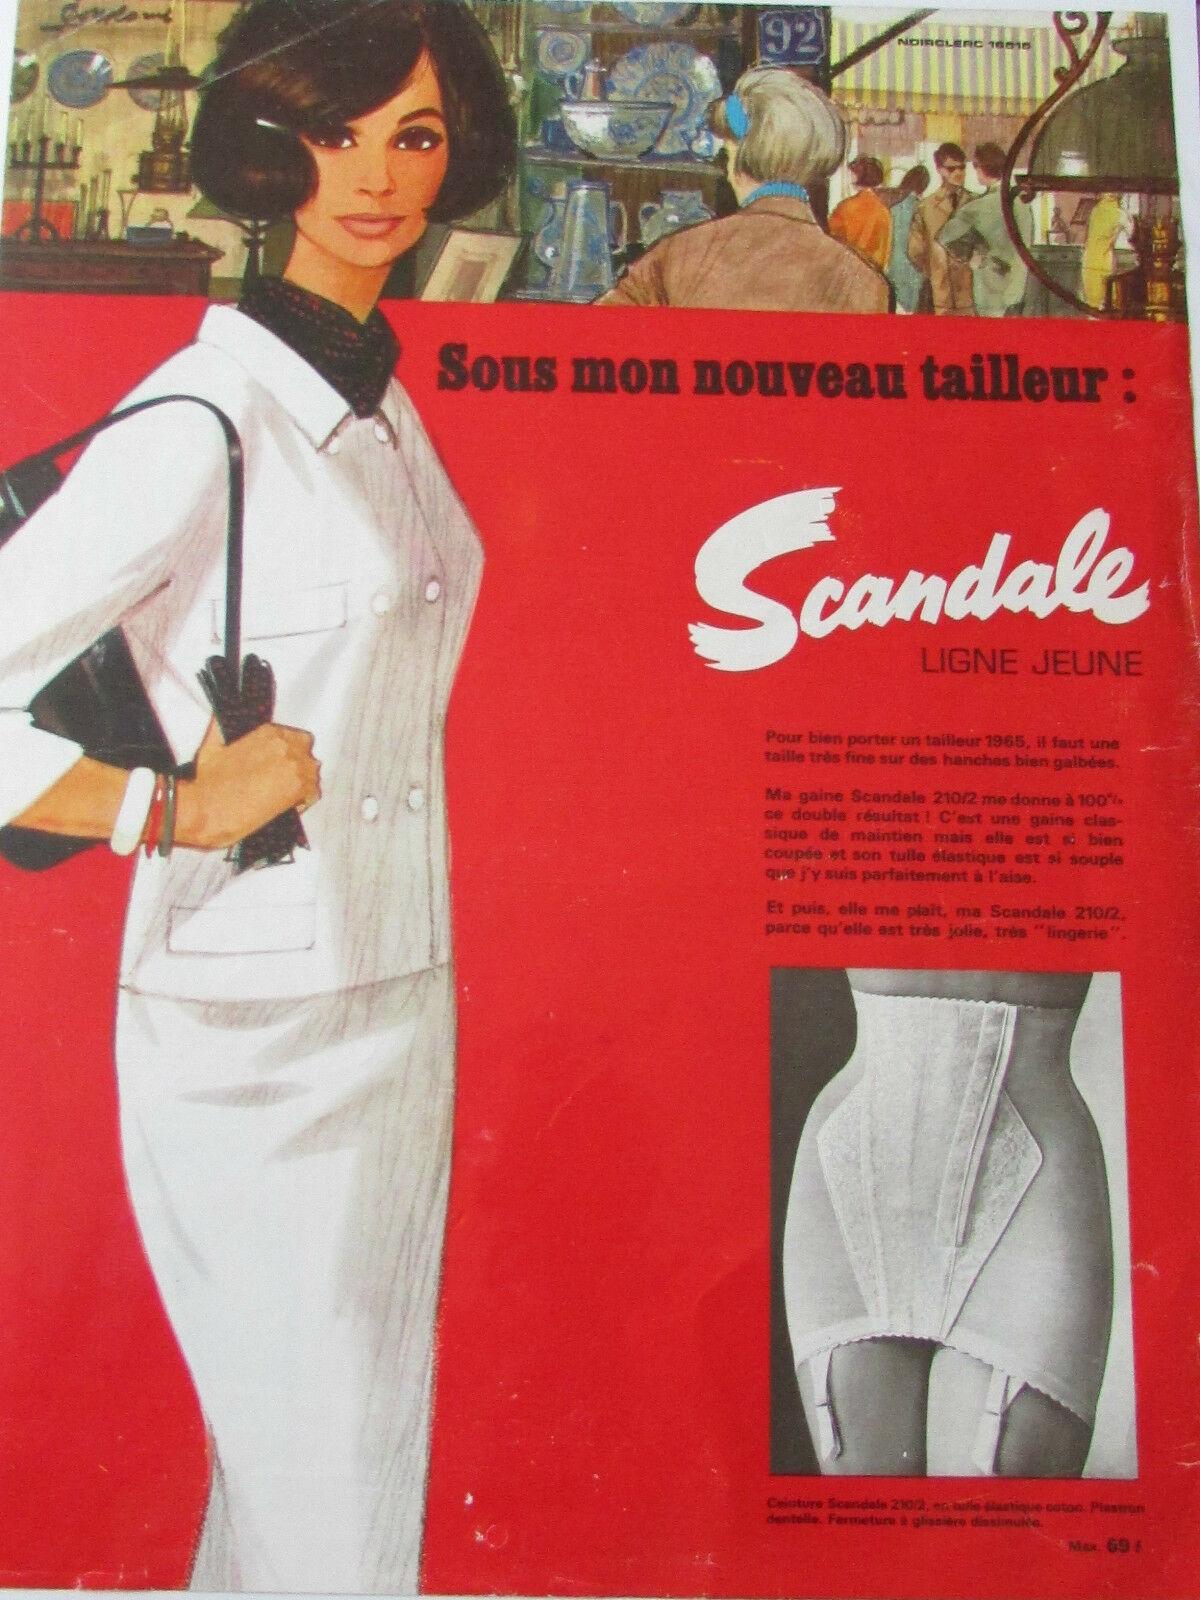 scandale 1965 pierre-couronne A1 tailleur